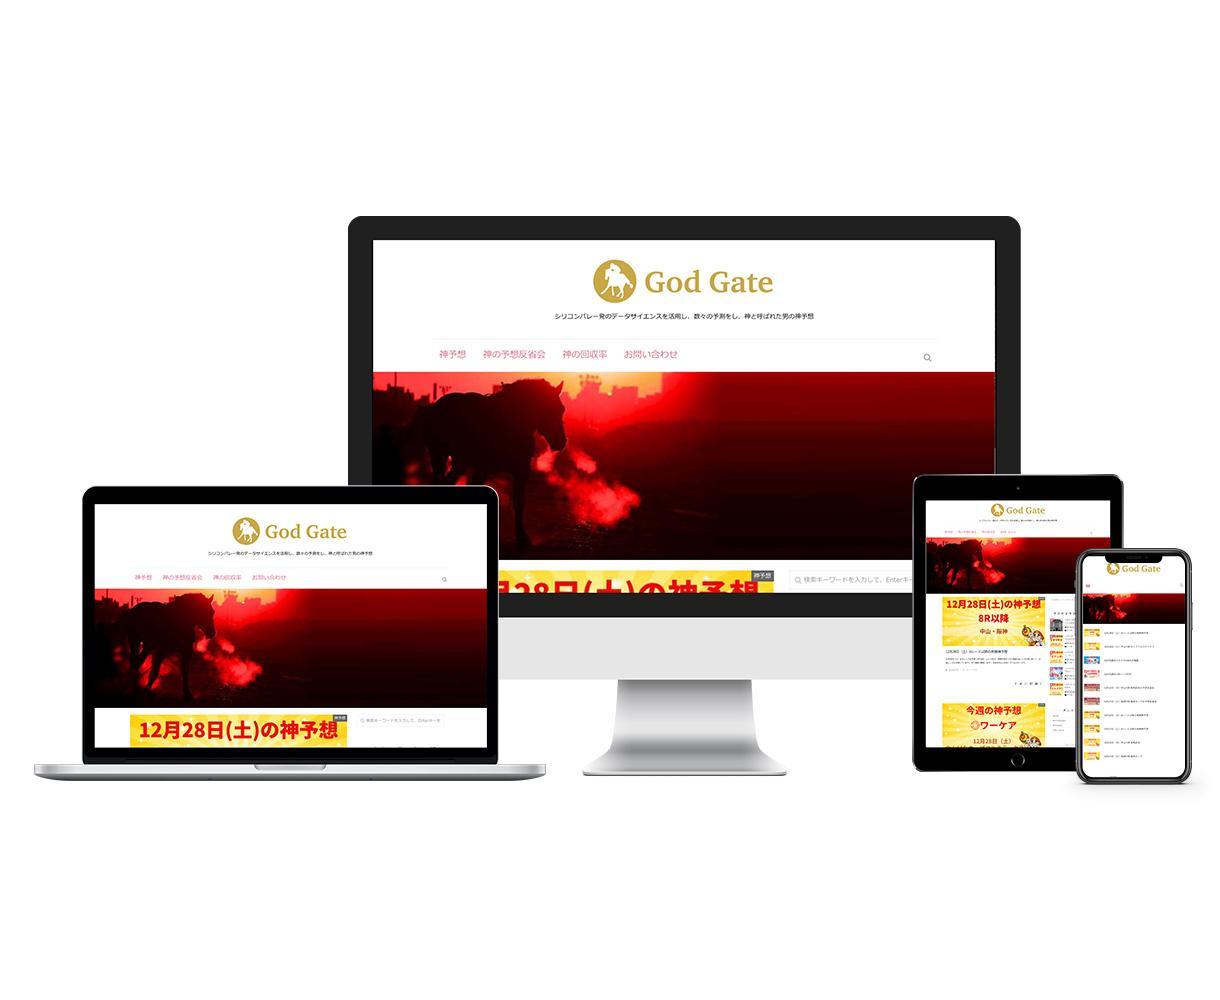 WordPressオリジナルサイトを作成します SEO対策・スマホ対応 中規模サイト向けのプランです。